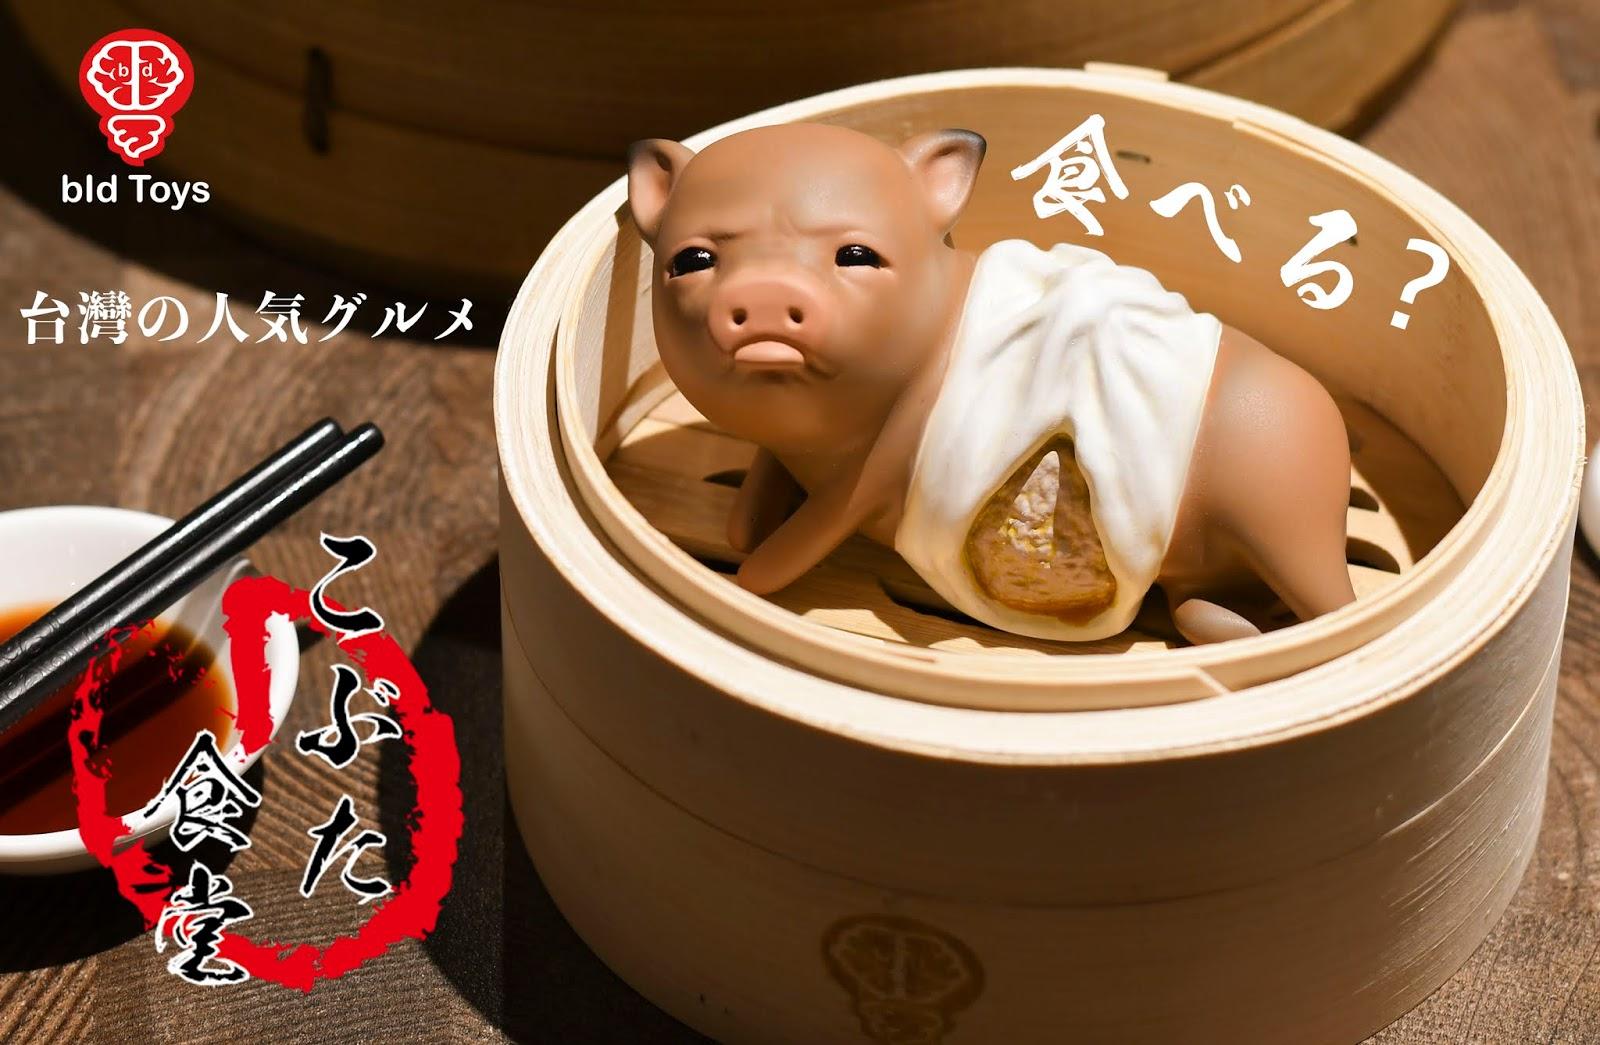 Kobuta Shokudou Shaoron de Bid Toys-min